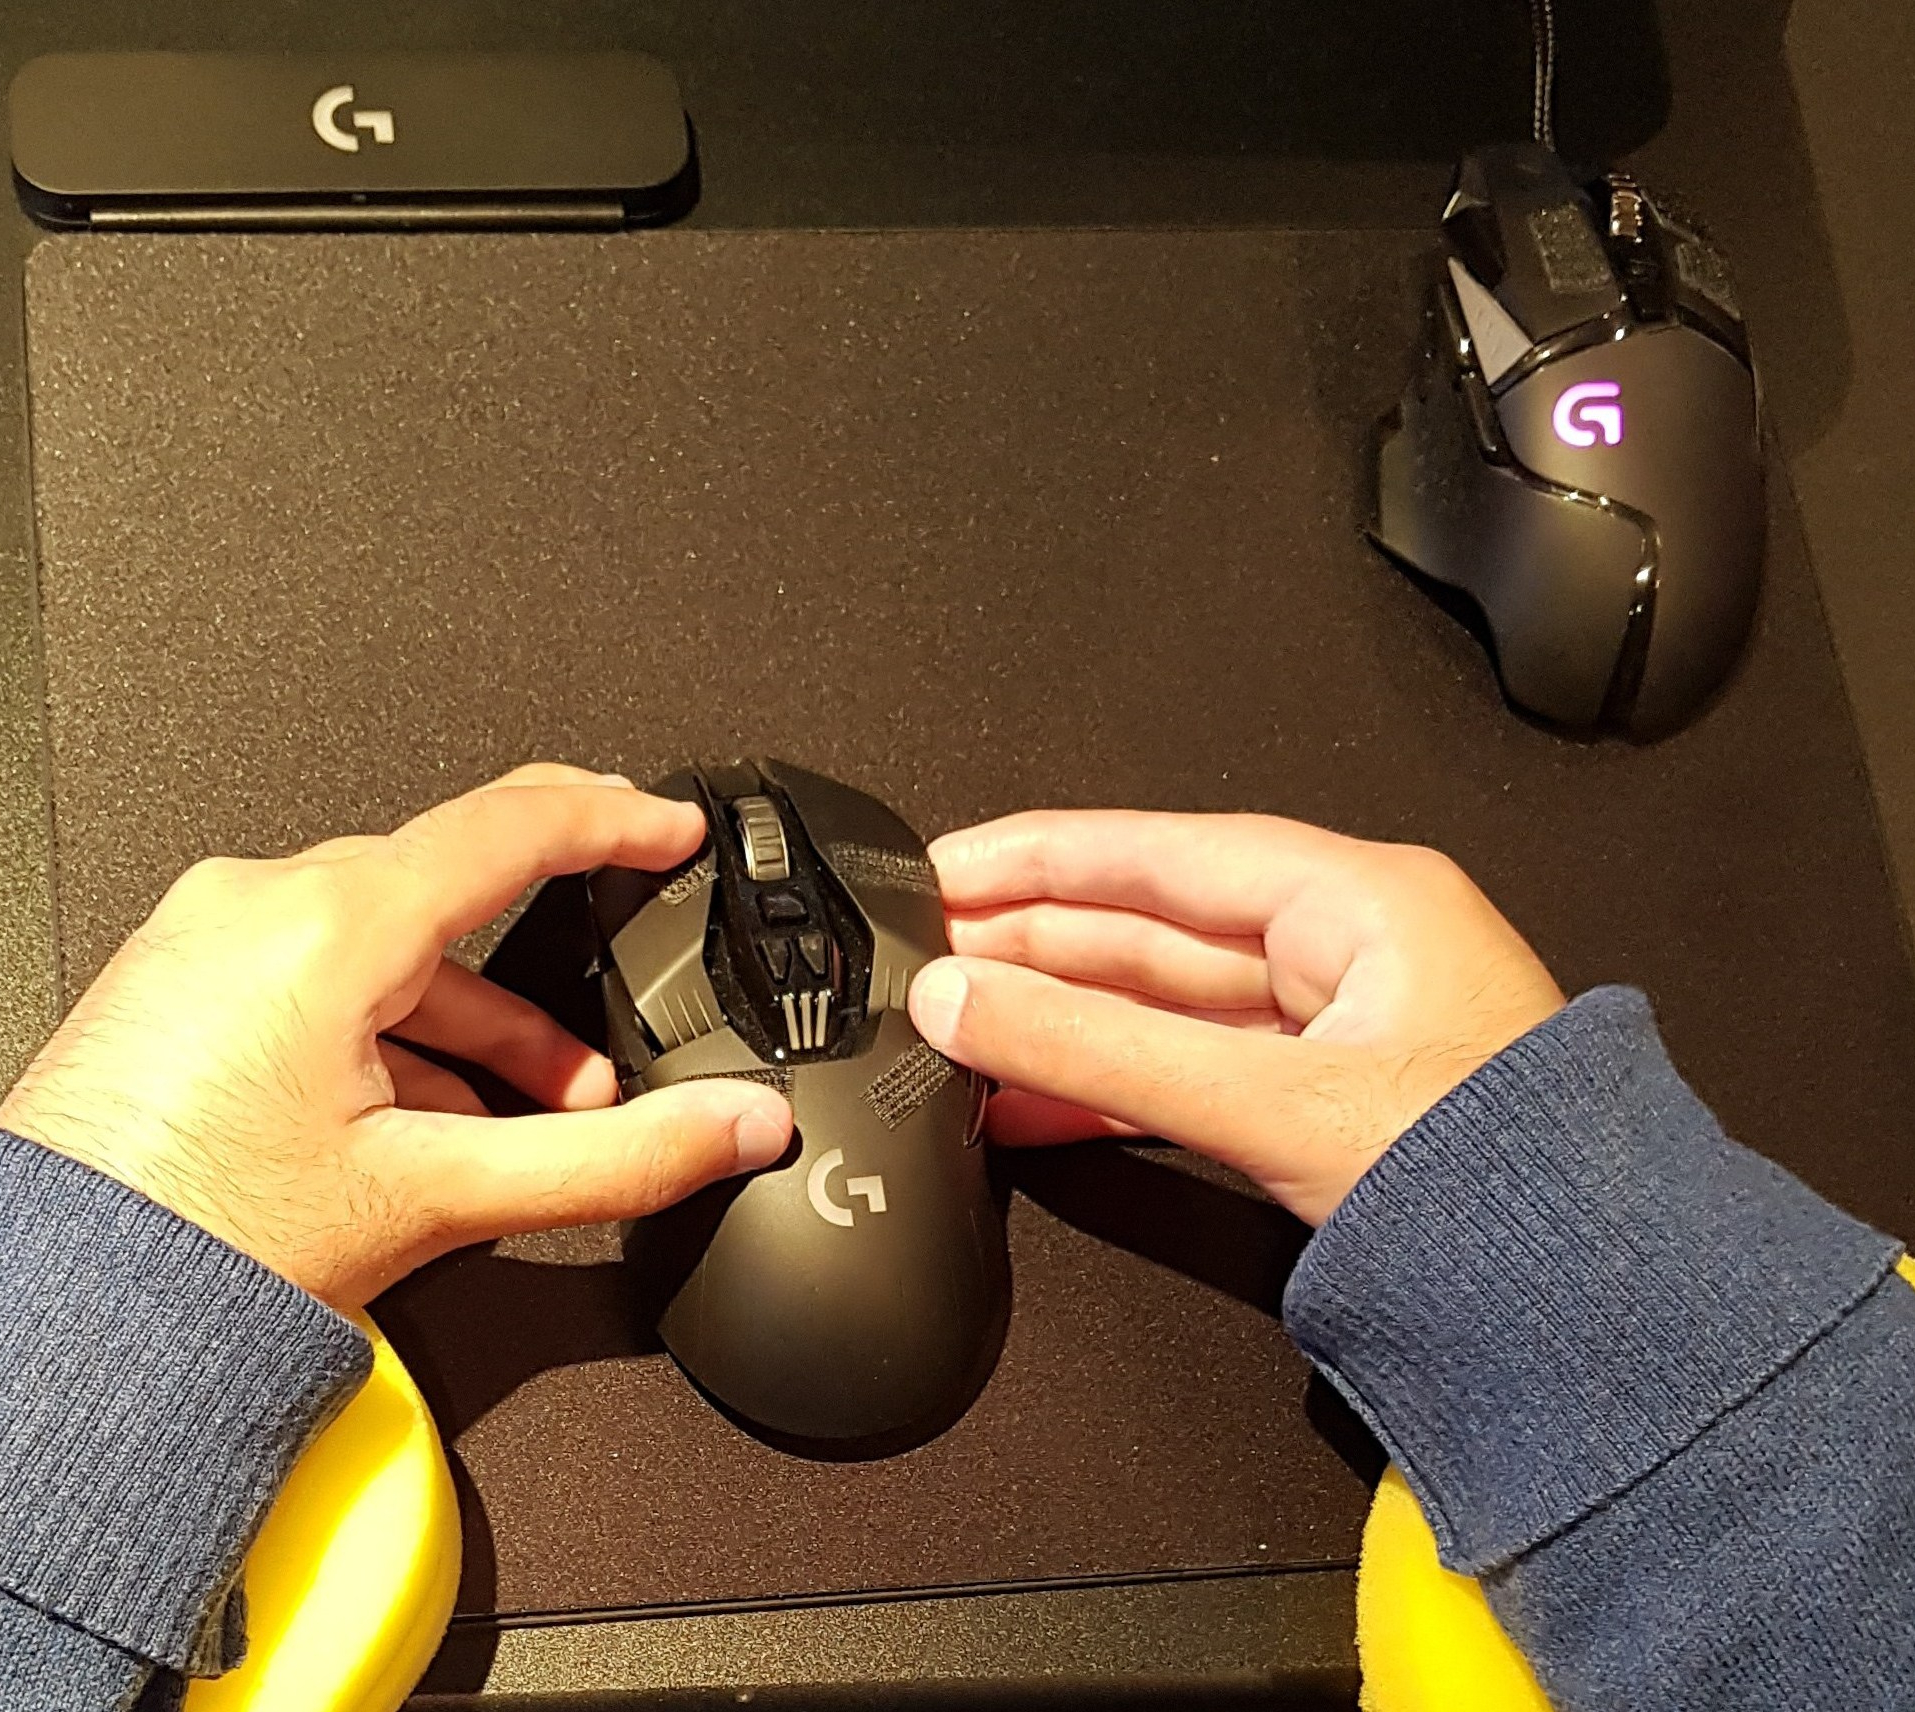 Holding a Logitech G903 Mouse